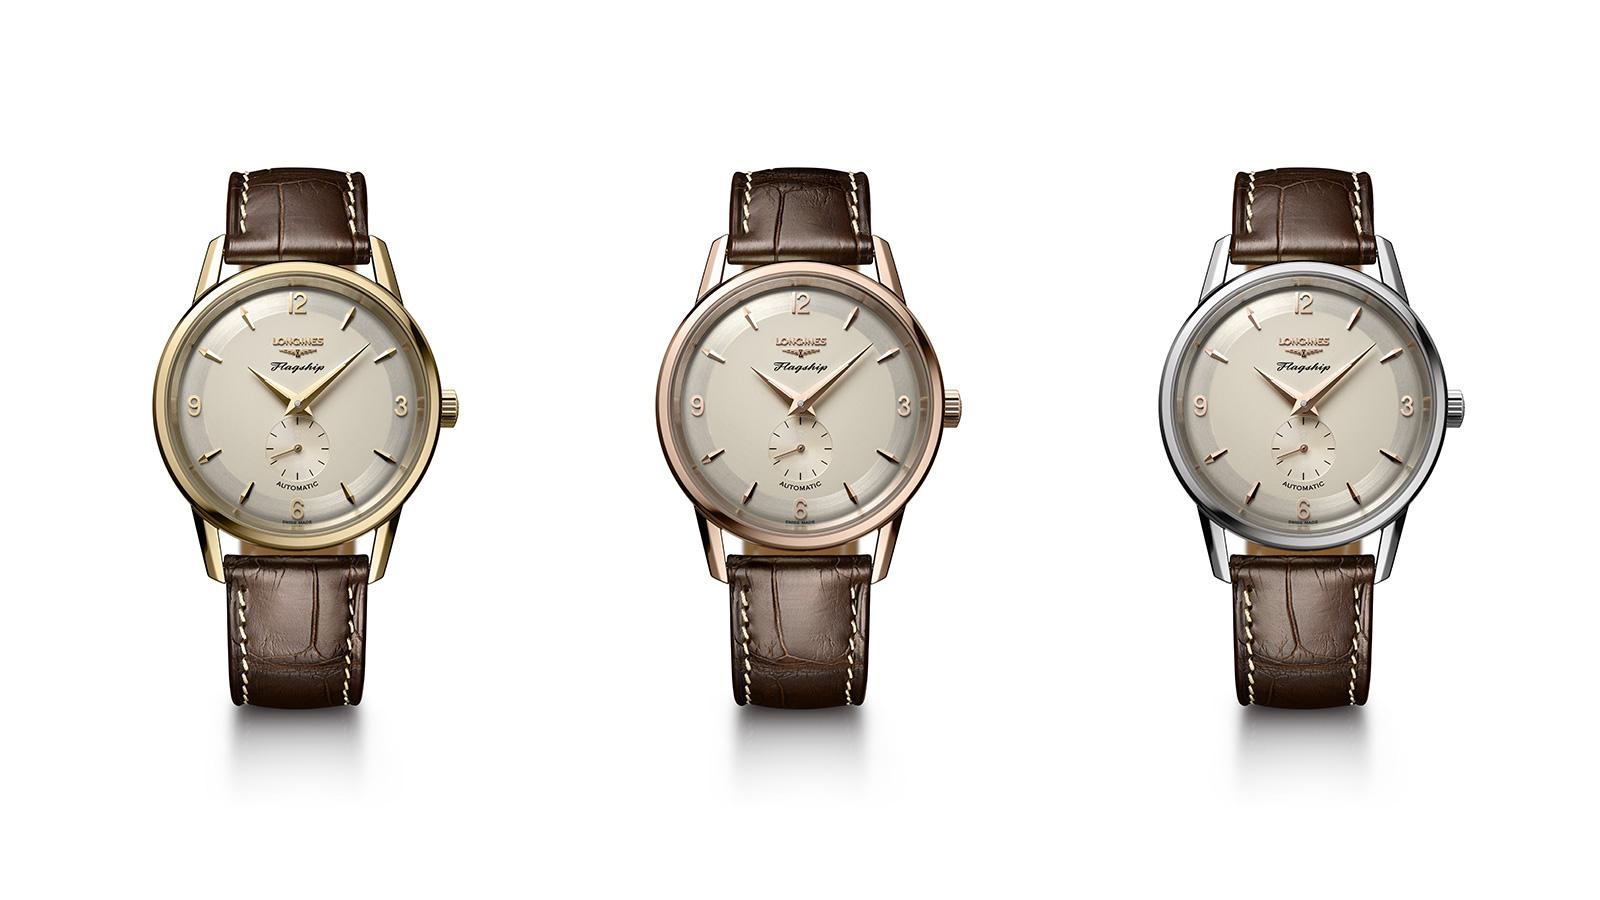 Naziv: news-flagship-heritage-60th-anniversary-all-watches-1600x900.jpg, pregleda: 199, veličina: 184,6 KB